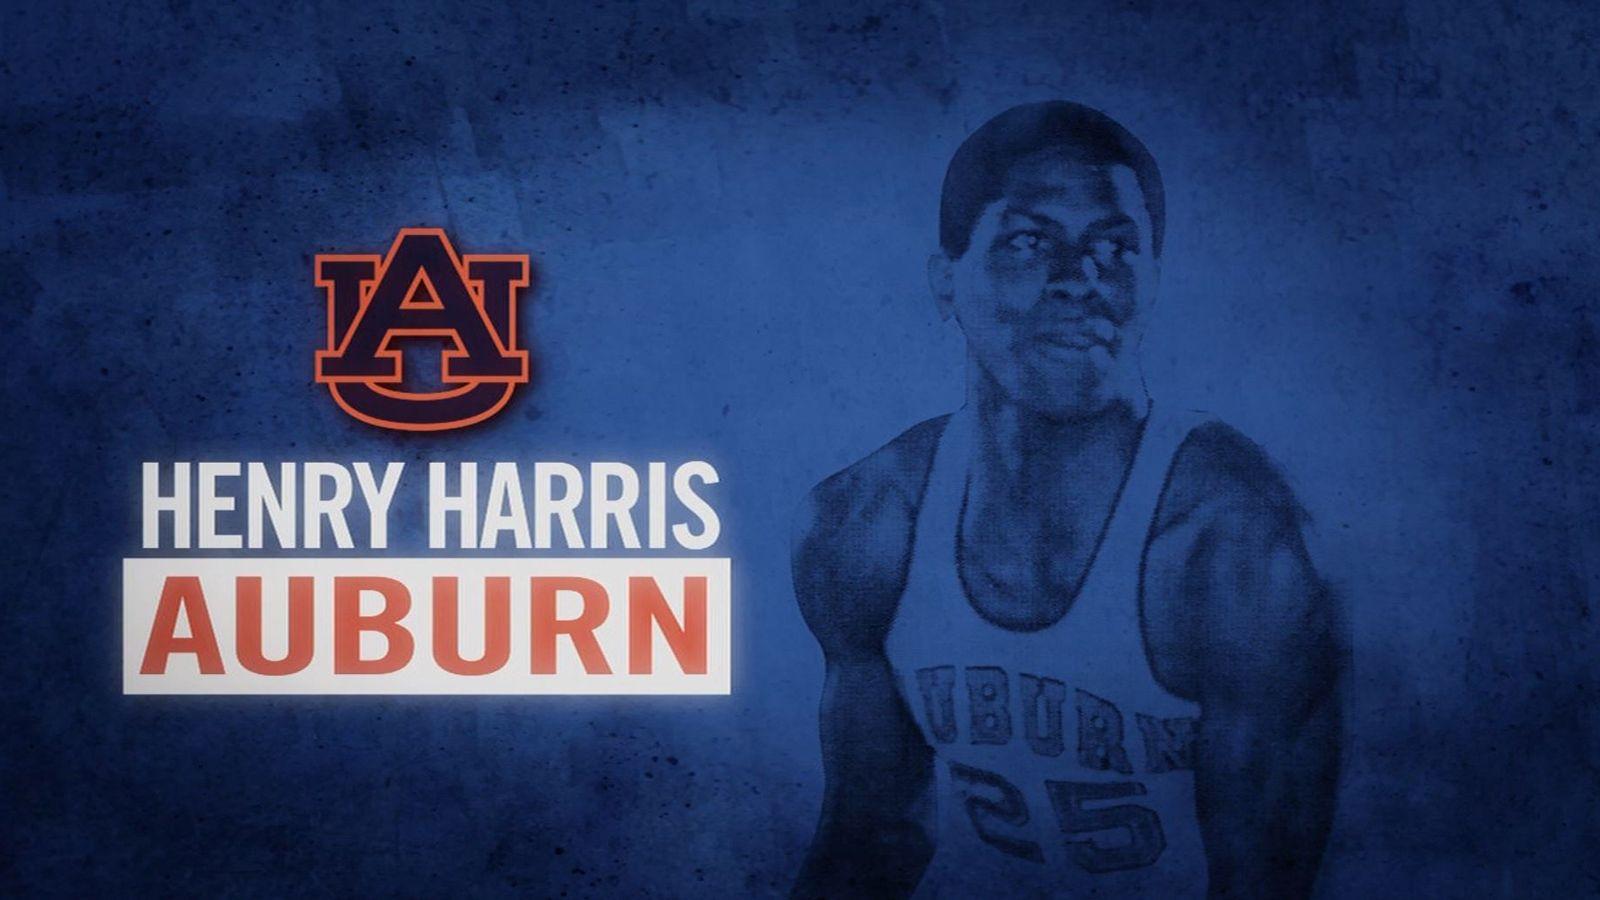 SEC celebrates Black History Month: Auburn